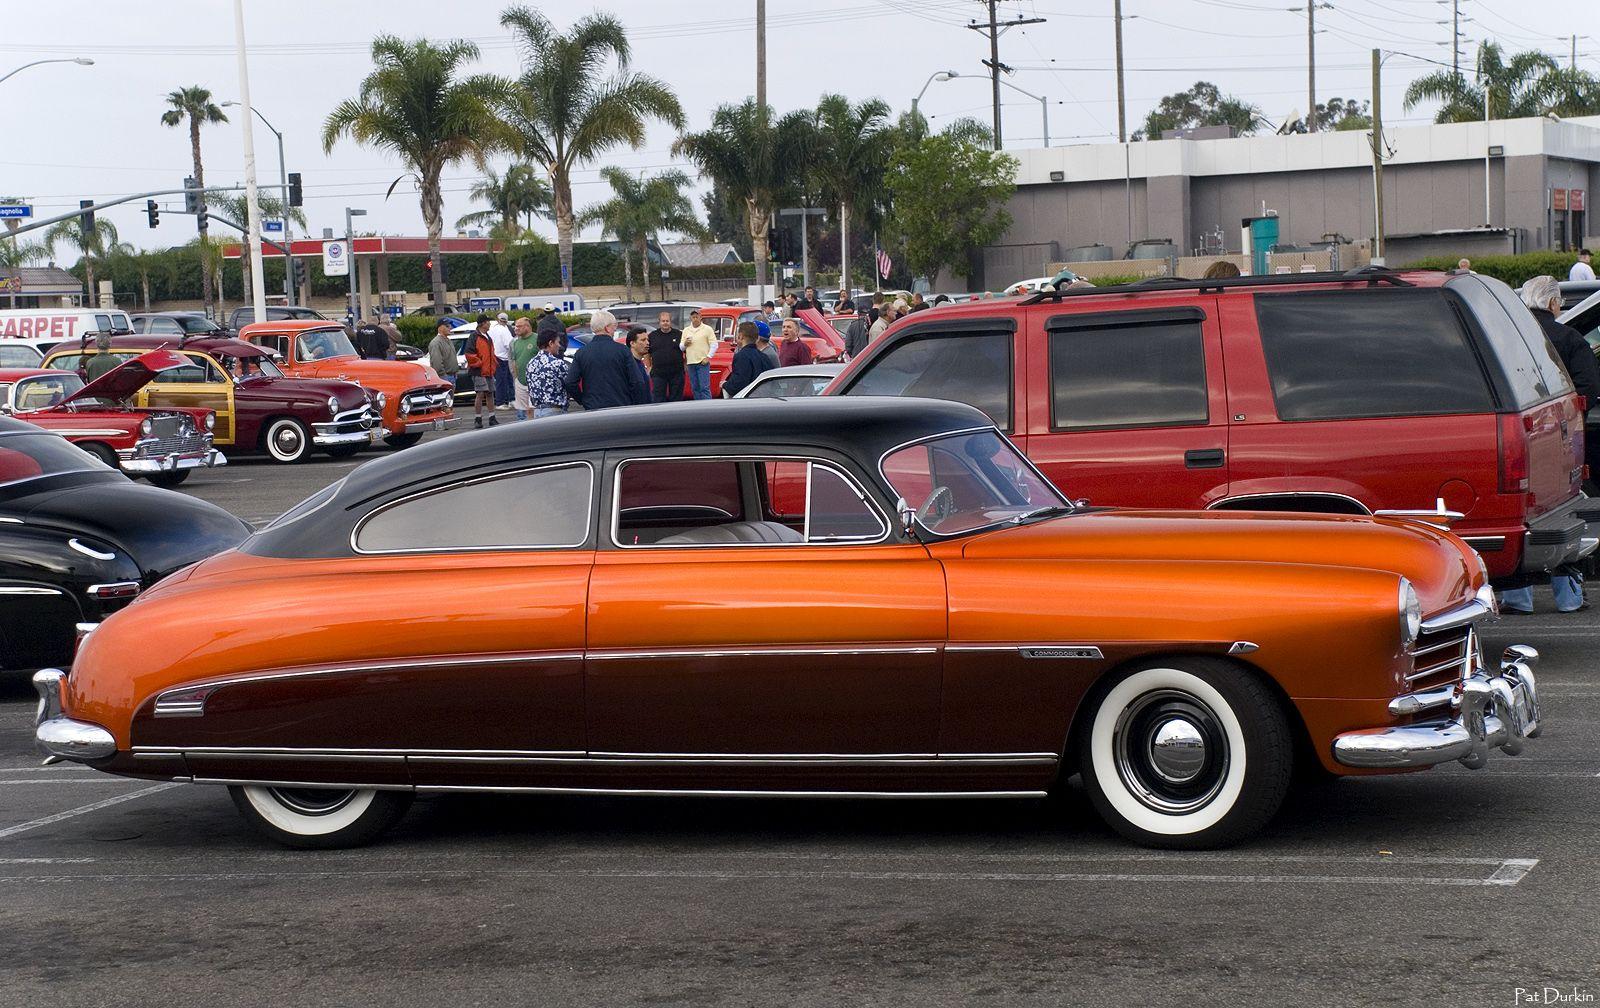 1955 dodge royal lancer convertible cream black fvr cars - Hudson Commodore 1950 Hudson Commodore 8 2 Door Coupe Mod Copper Metallic